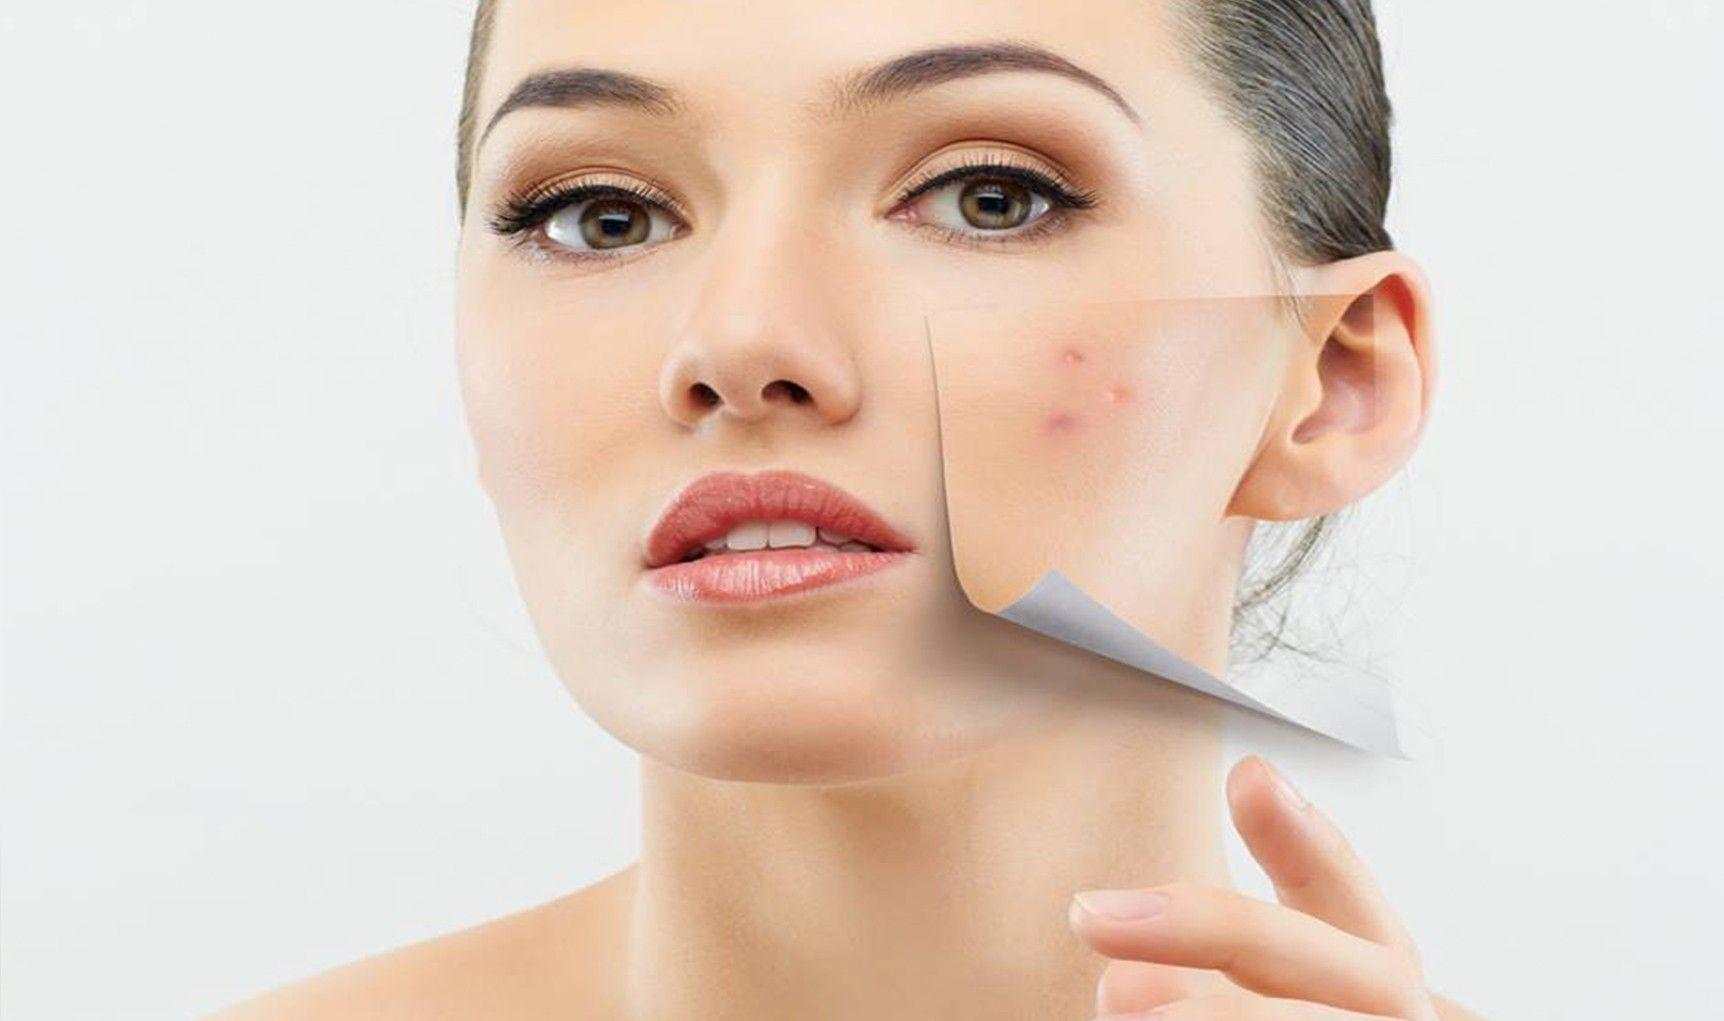 Dermatological Diseases Photo